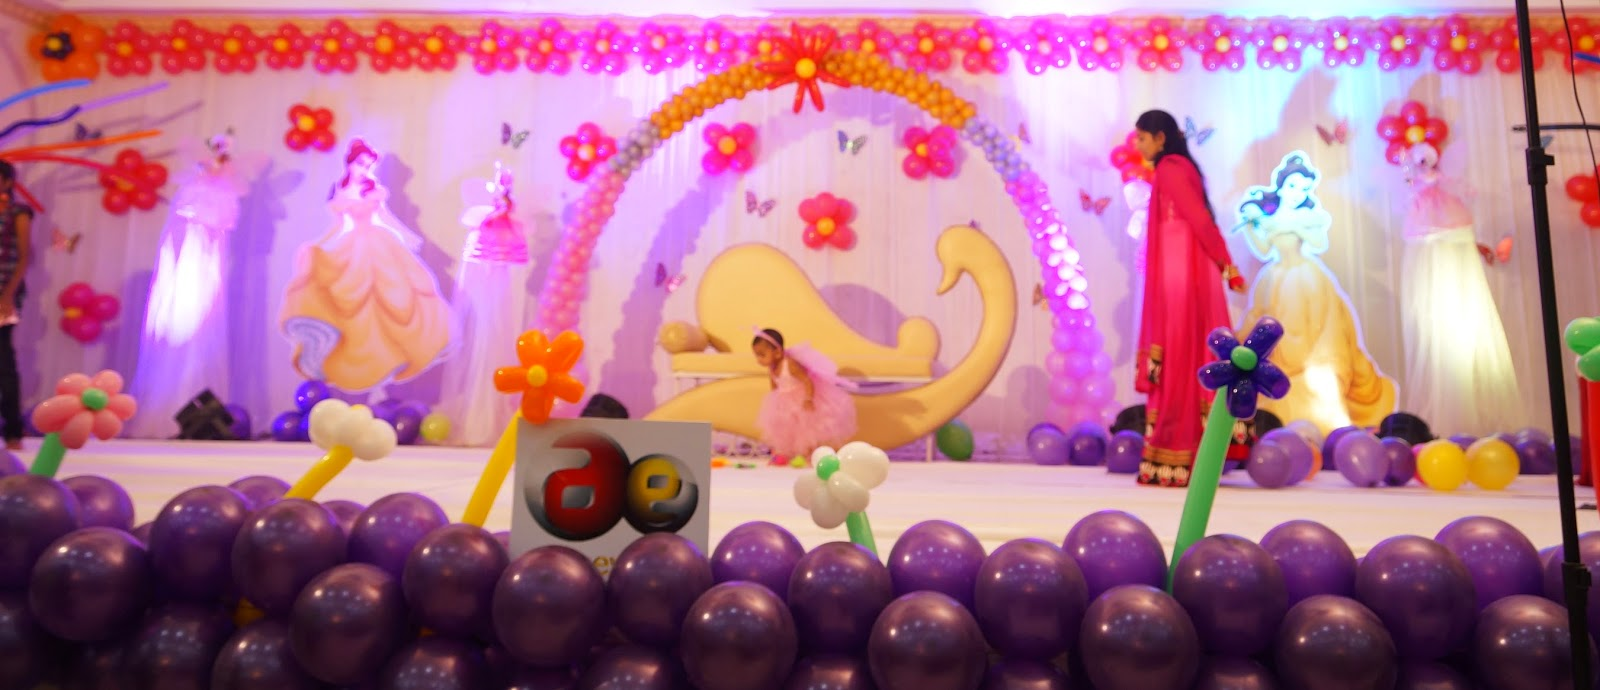 Aicaevents India Princess Theme Birthday Decorations